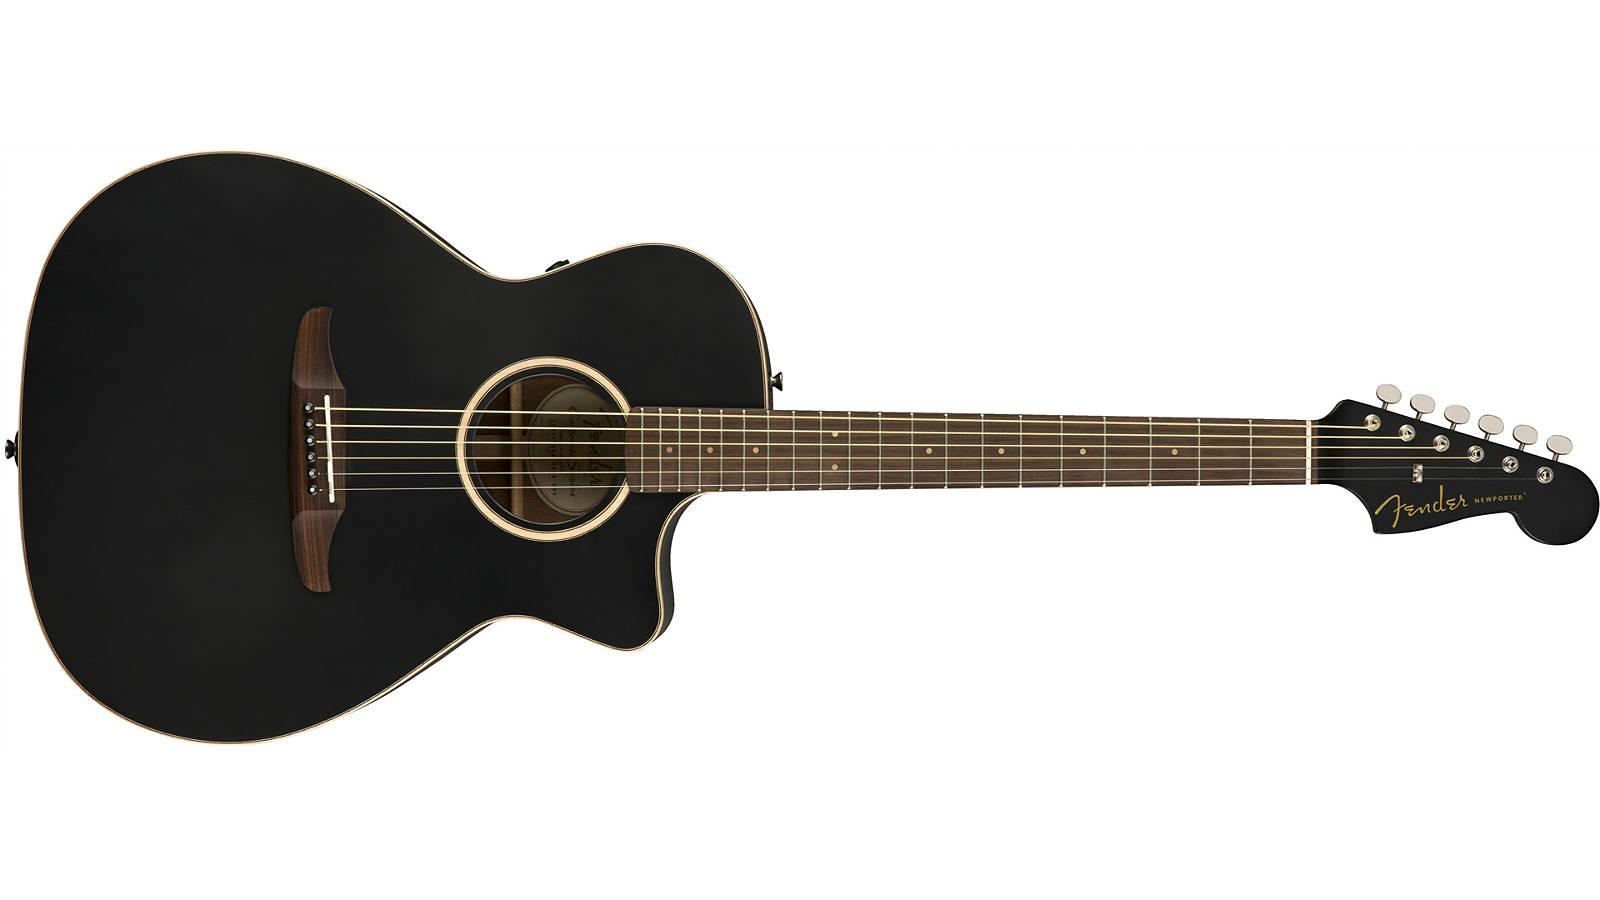 Fender Newporter Special Matte Black